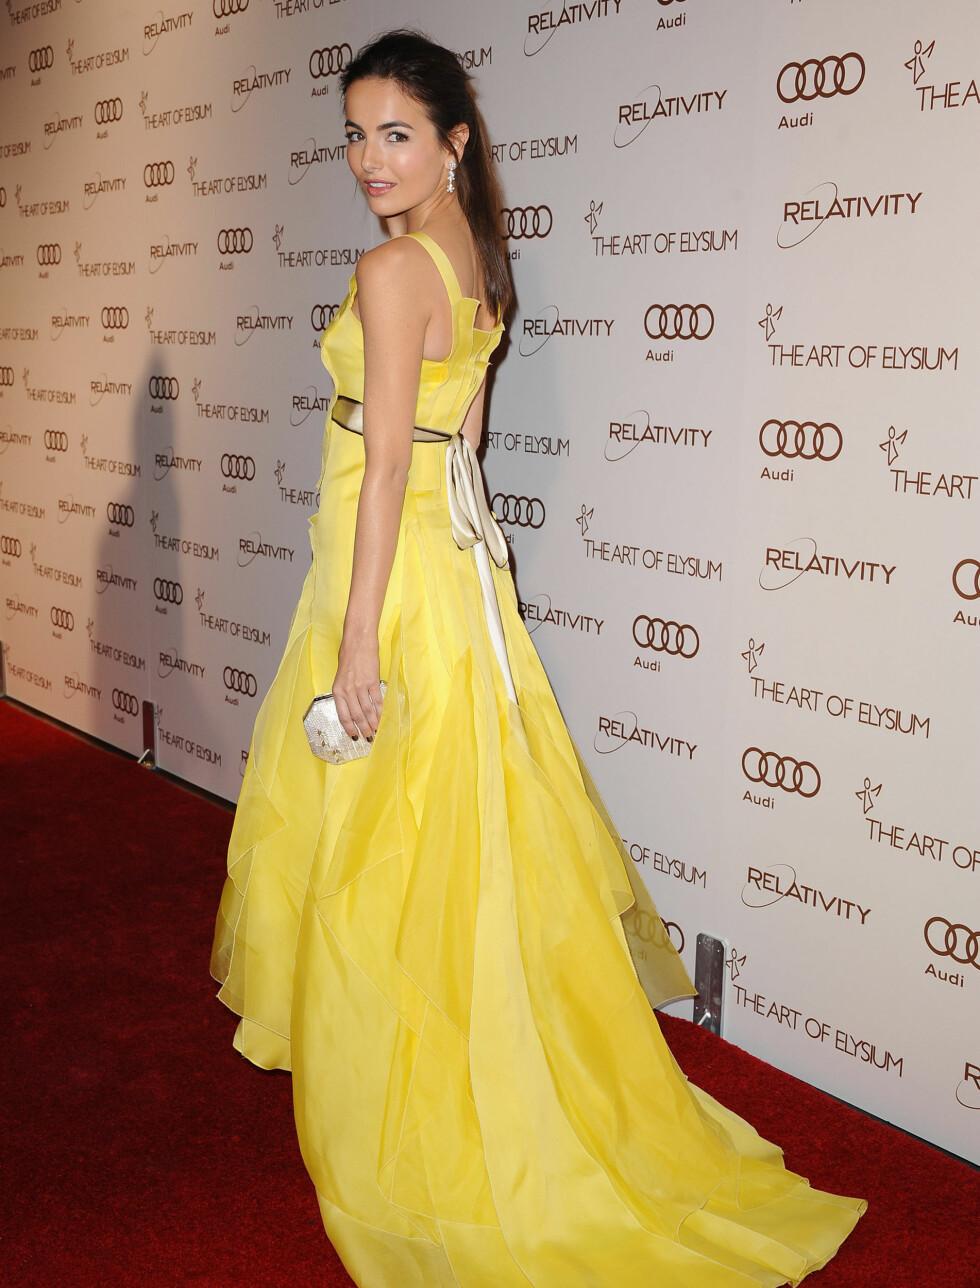 SOLSTRÅLE: Camilla Belle (25) så ut som en solstråle da hun ankom gallaen i en Carolina Herrera-kjole.  Foto: Stella Pictures